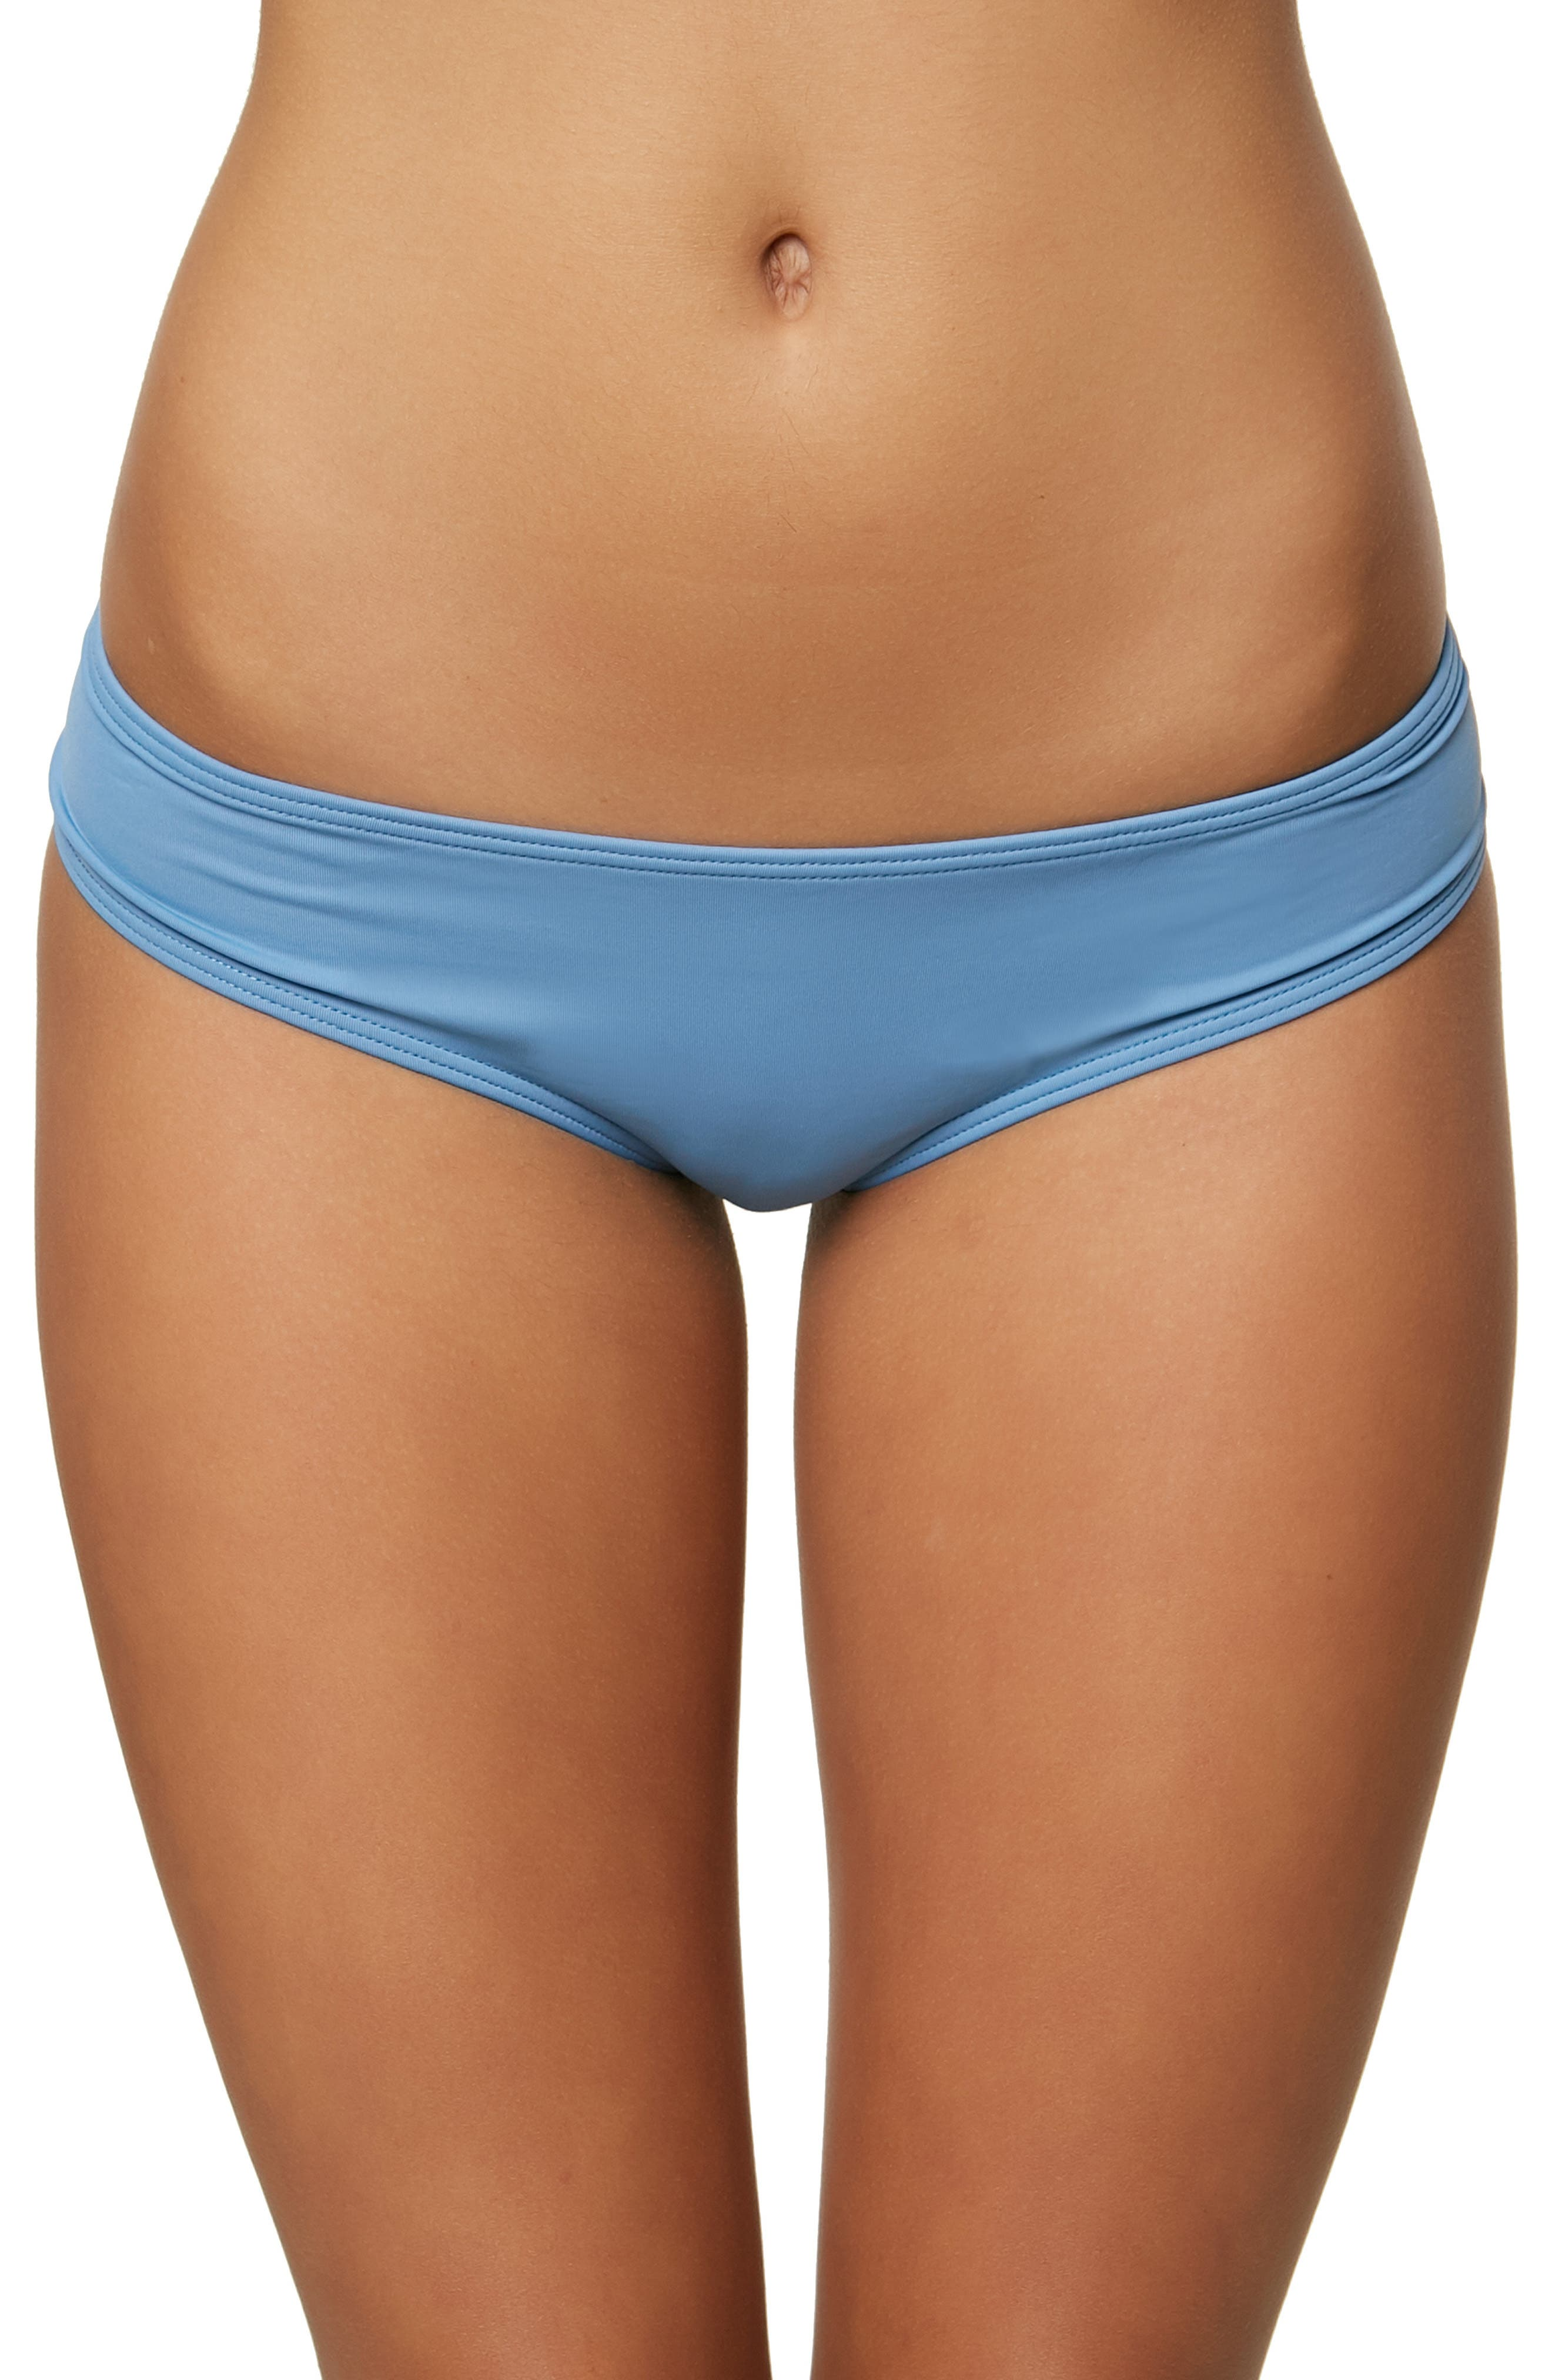 Salt Water Solids Hipster Bikini Bottoms,                         Main,                         color, WASHED INDIGO